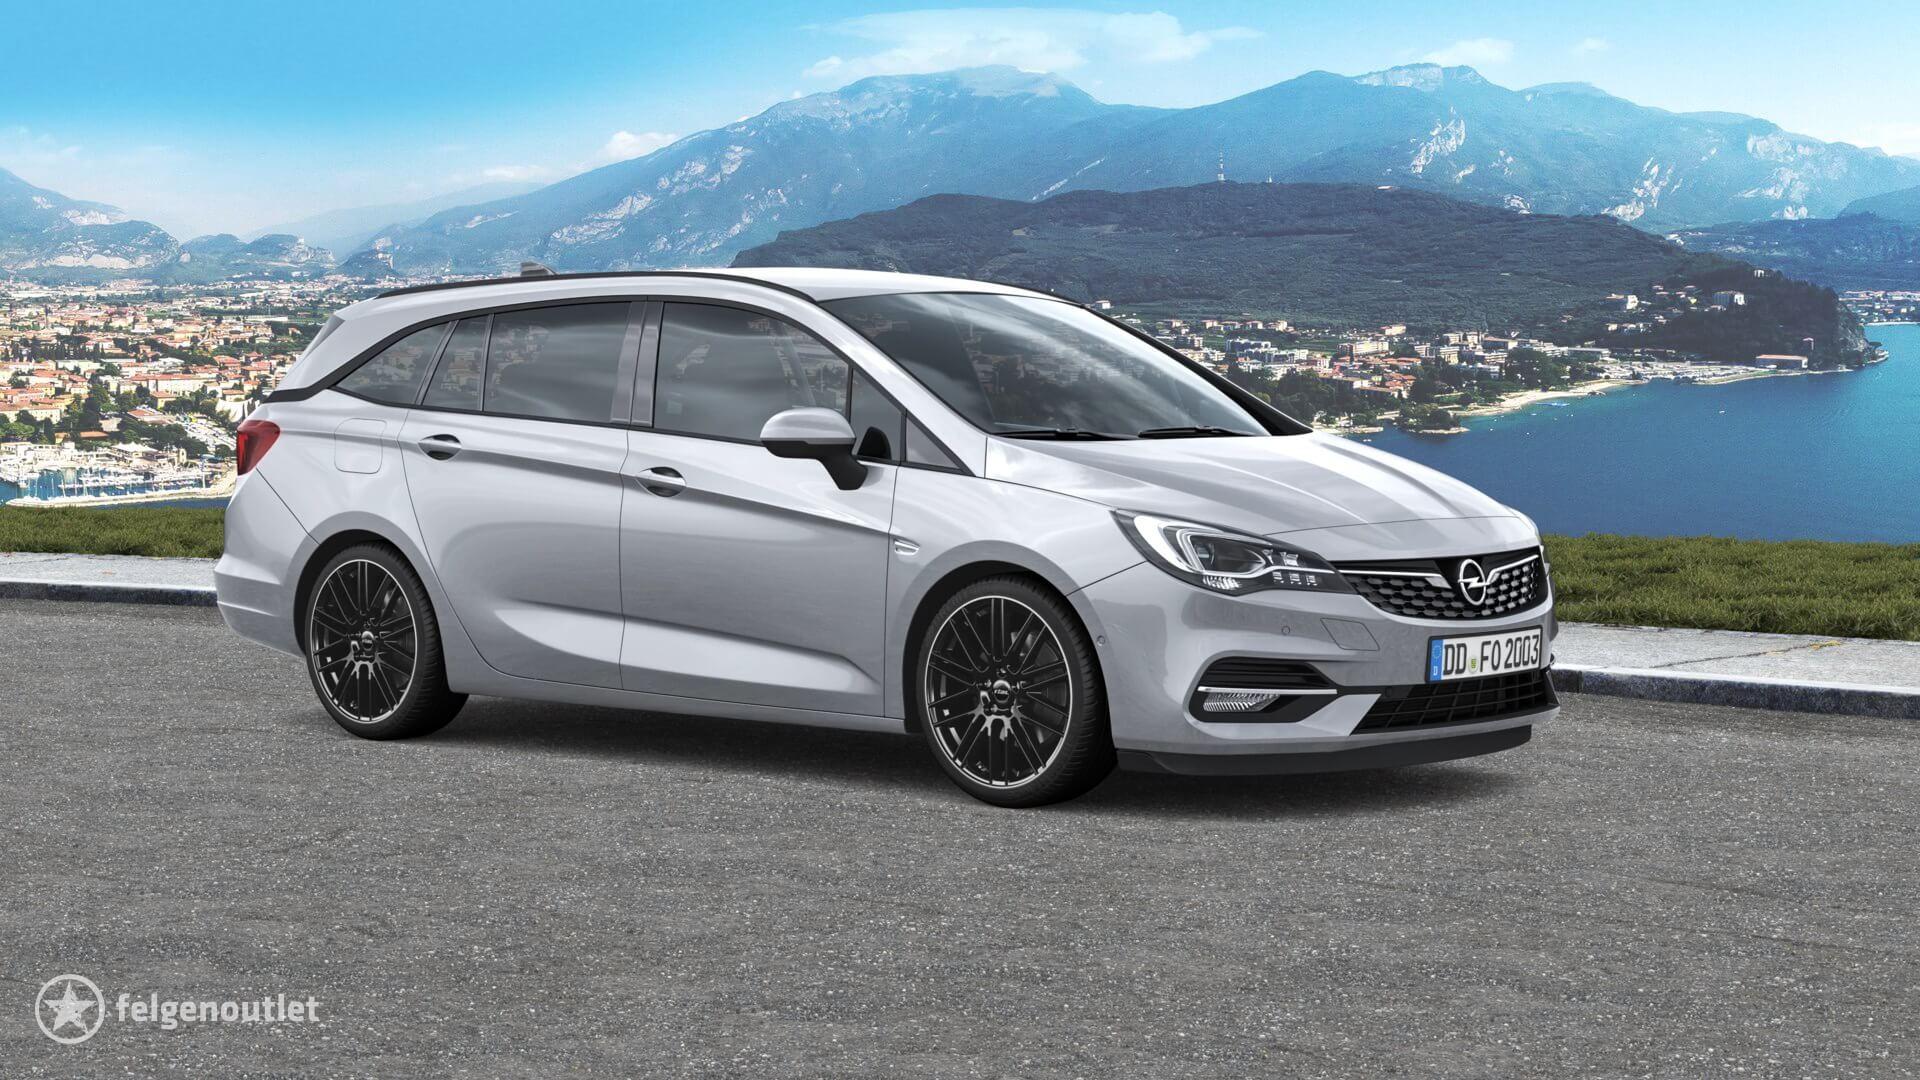 Rial Kibo diamant-schwarz hornpoliert Opel Astra K Sports Tourer